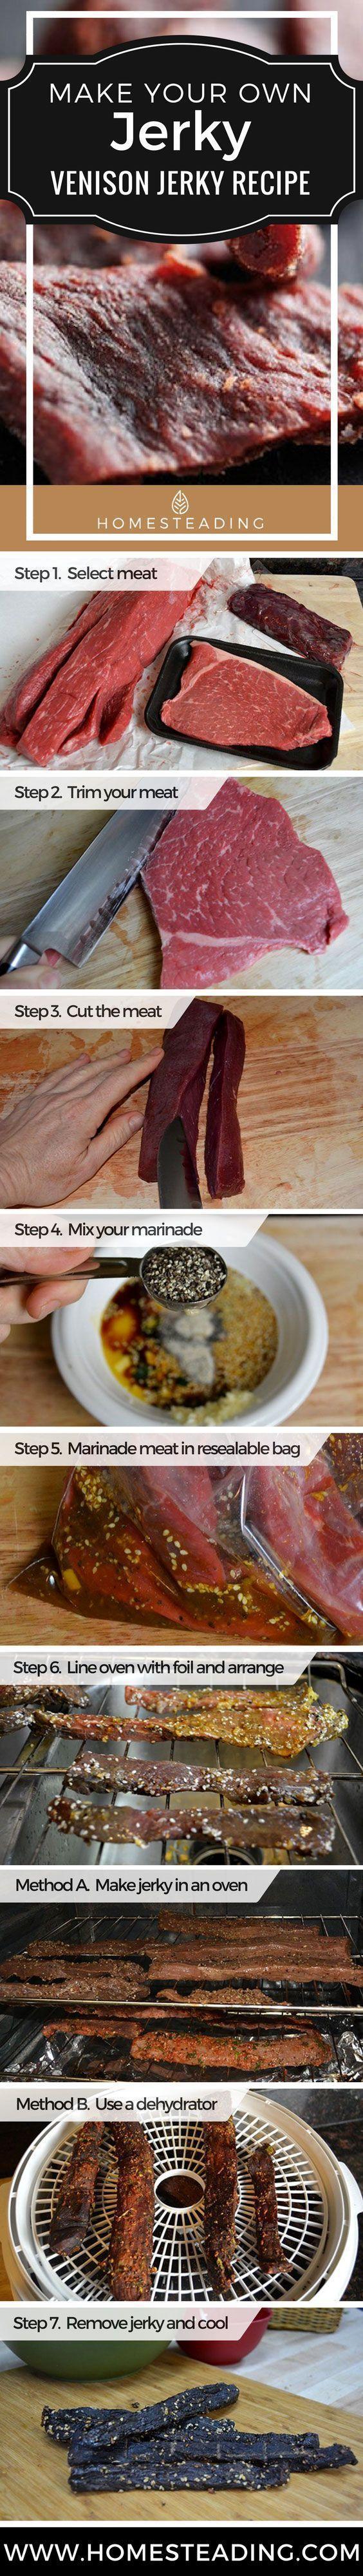 Step by Step Venison Jerky Recipe | Homesteading Recipe